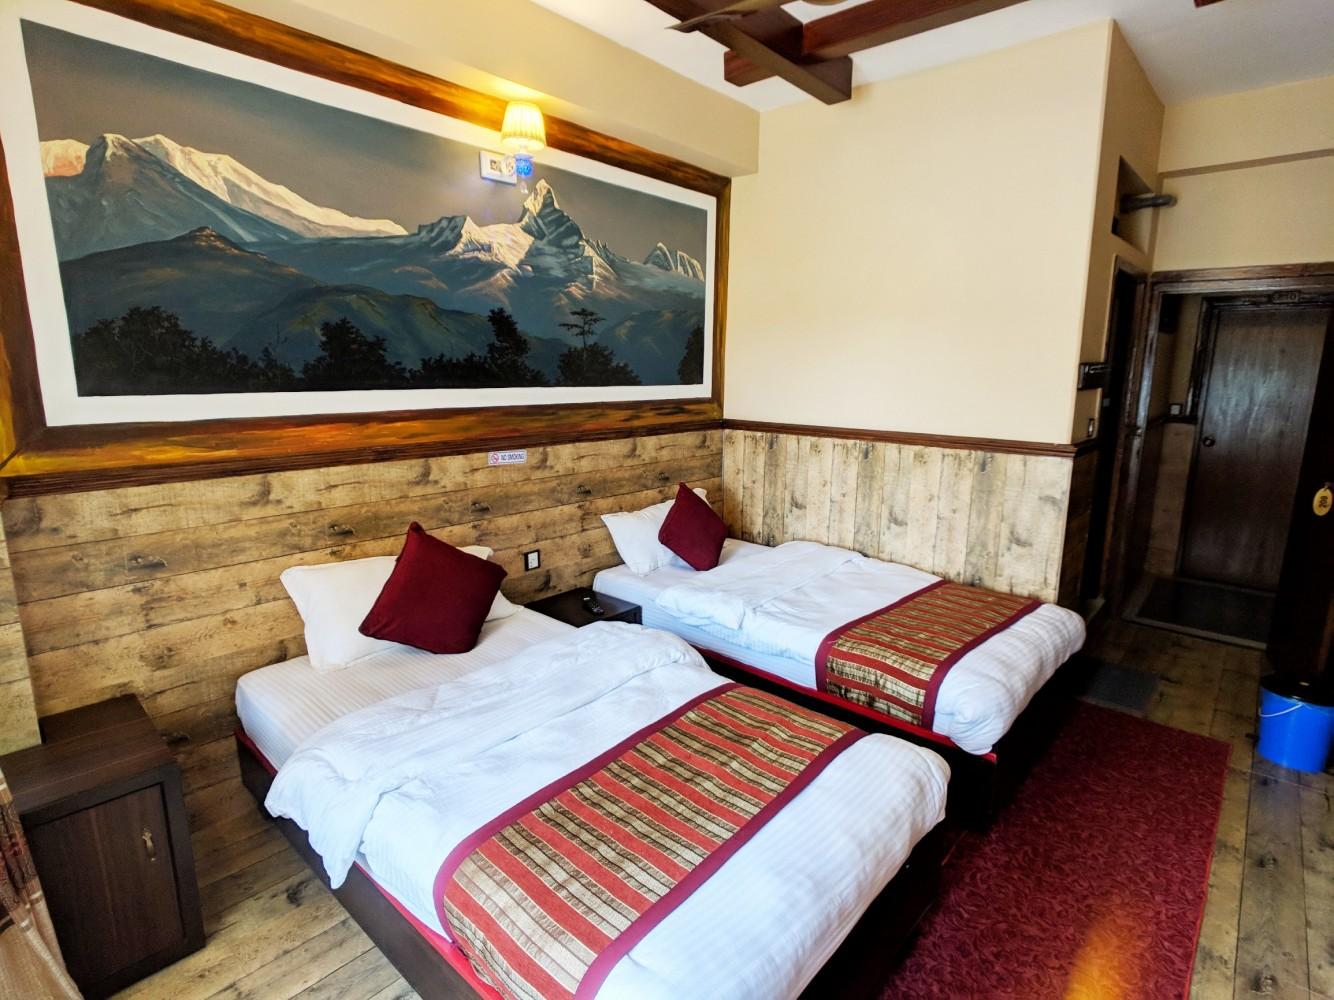 Hotel Forest Lake Backpackers Hostel Pokhara Nepal Best Price Voucher West Jogja Photo